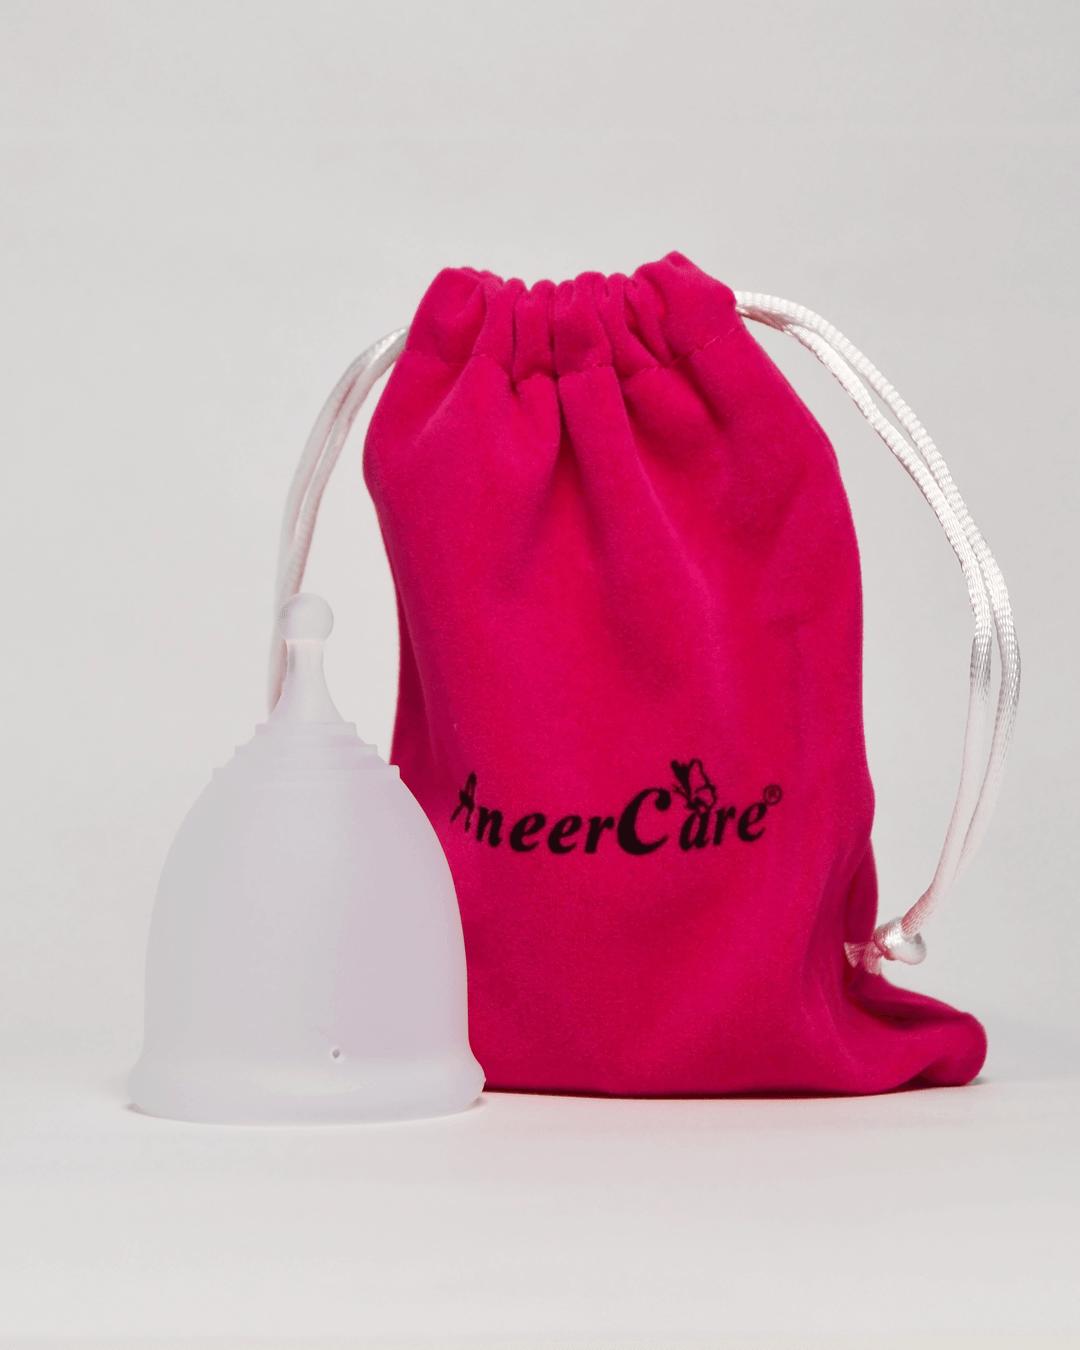 Белая менструальная чаша AneerCare с хвостиком «шар» (комплектация)